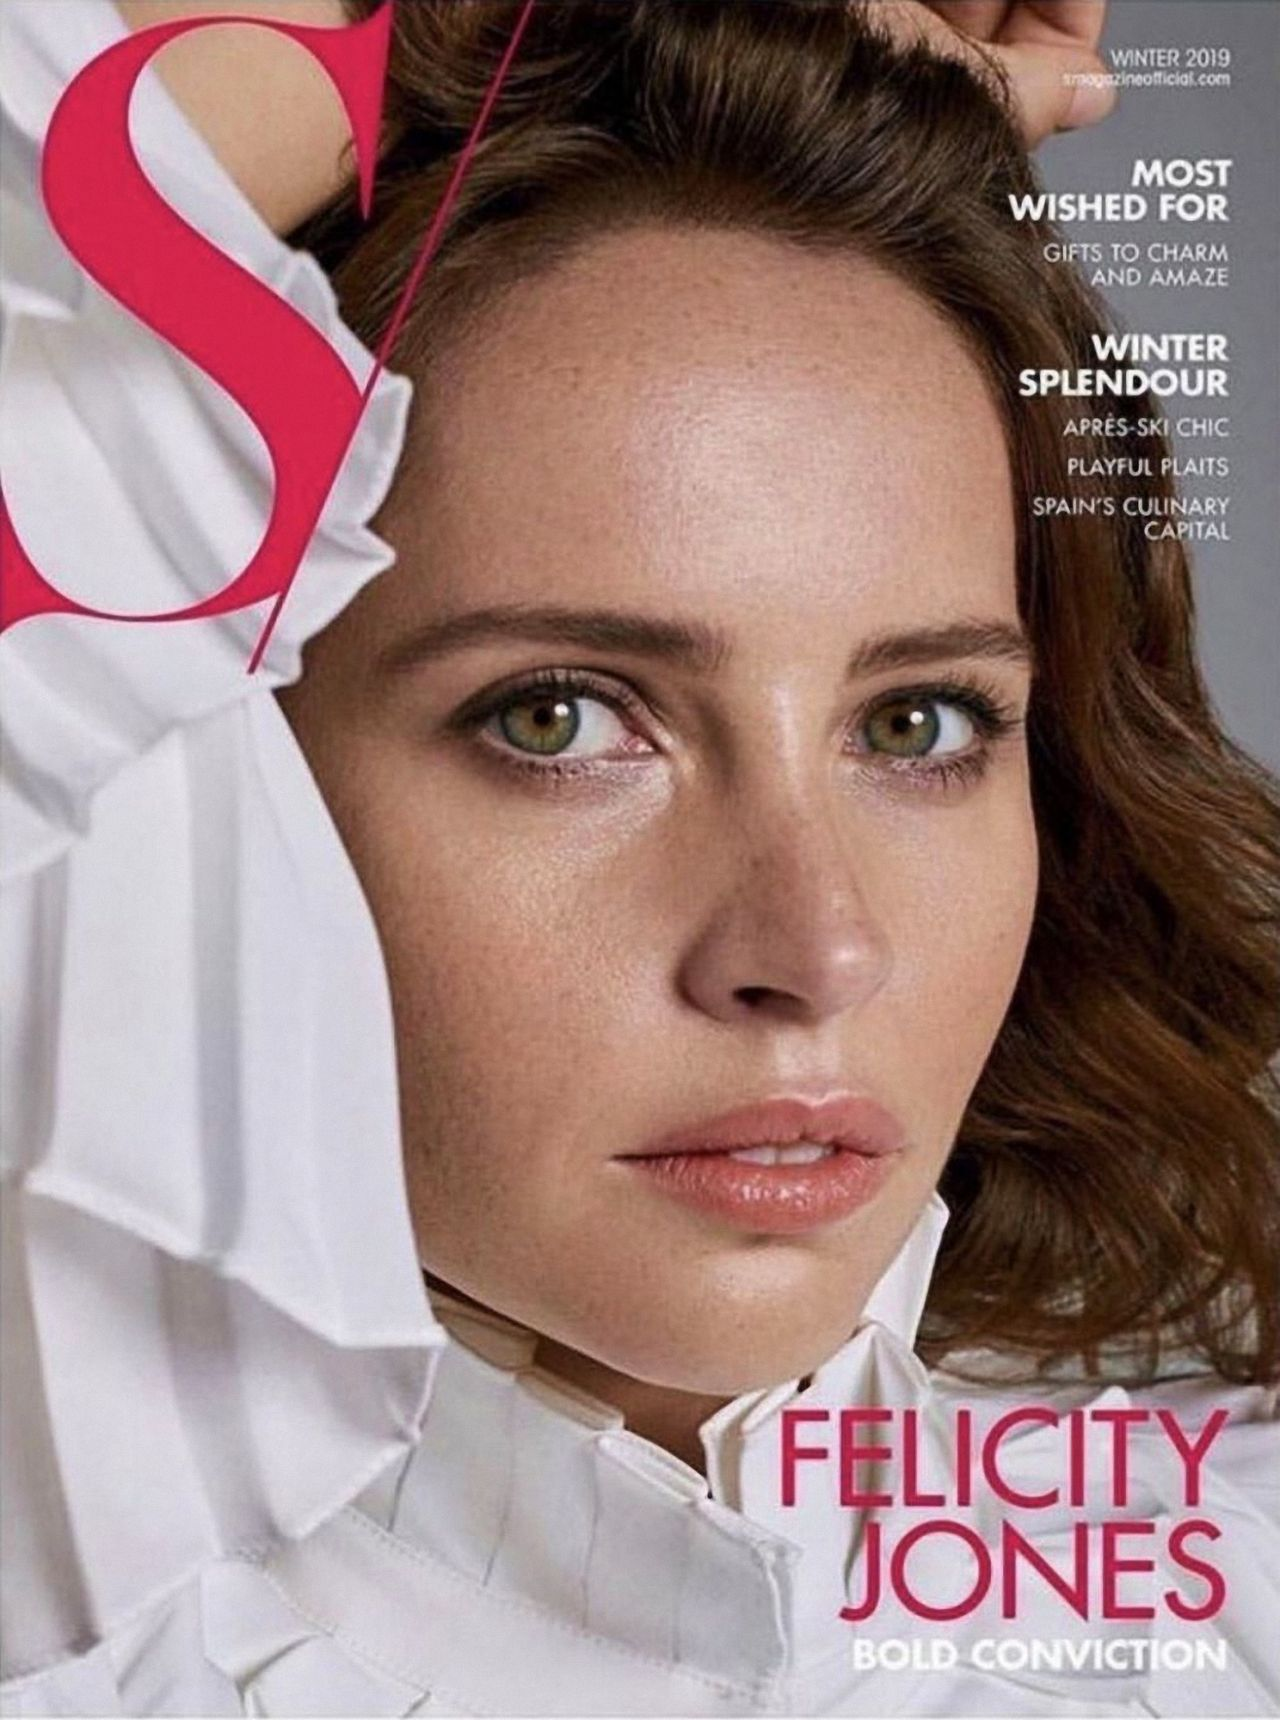 https://celebmafia.com/wp-content/uploads/2018/11/felicity-jones-s-magazine-winter-2019-4.jpg